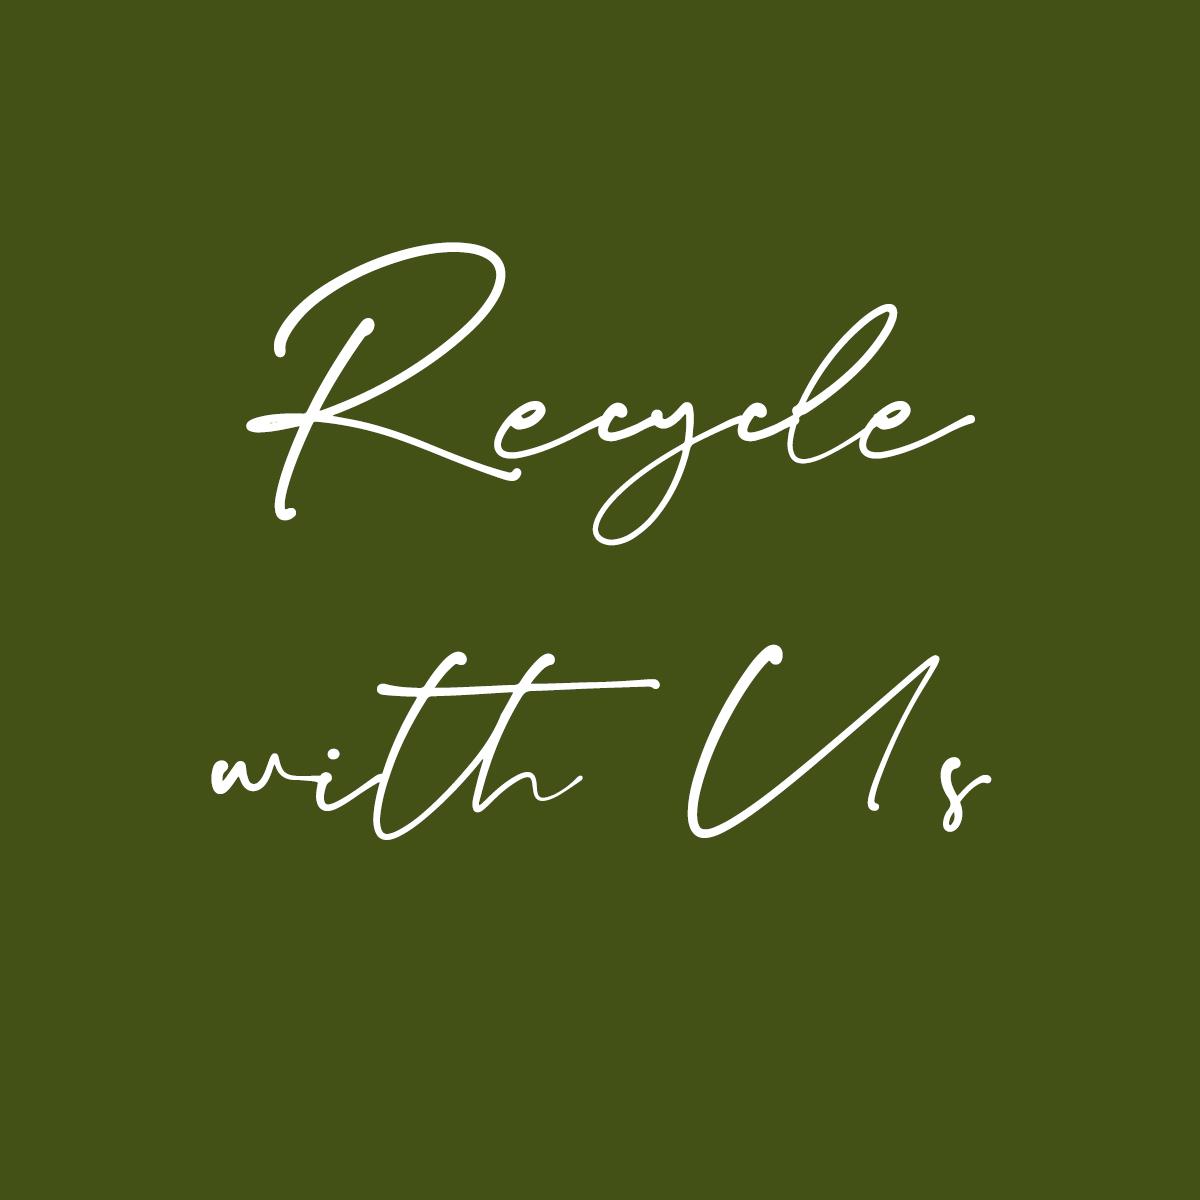 Fabric Recycling Program